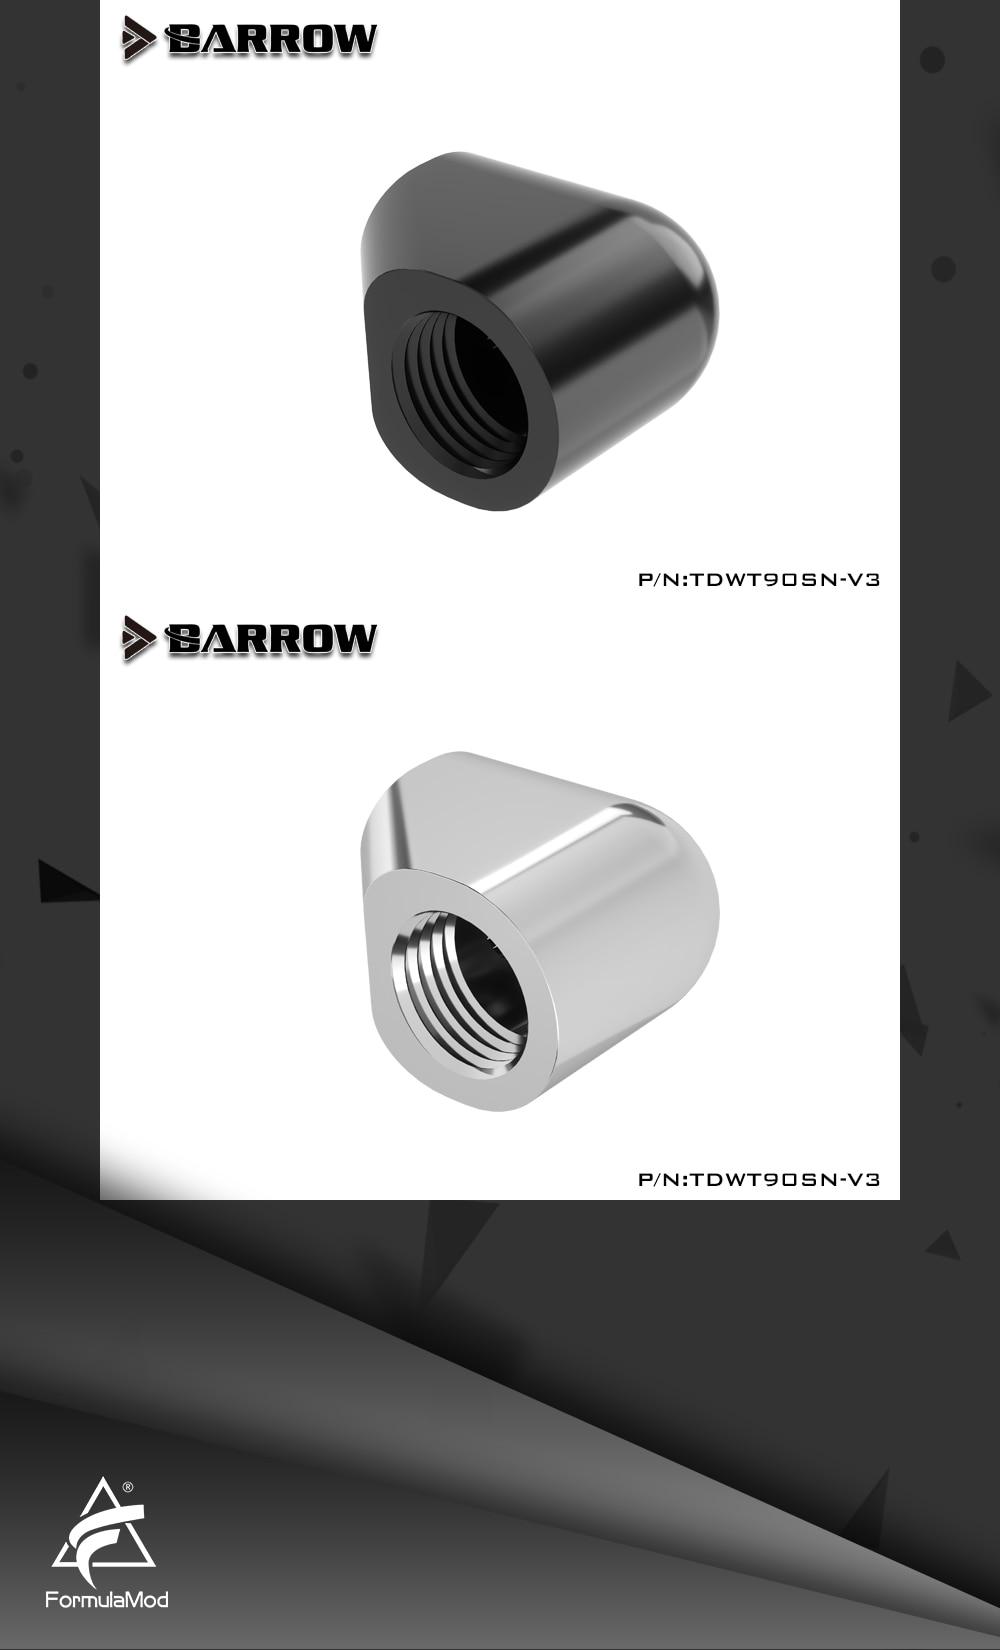 Barrow double internal G1/4'' thread 90 degree Fitting Adapter water cooling Adaptors water cooling fitting TDWT90SN-V3